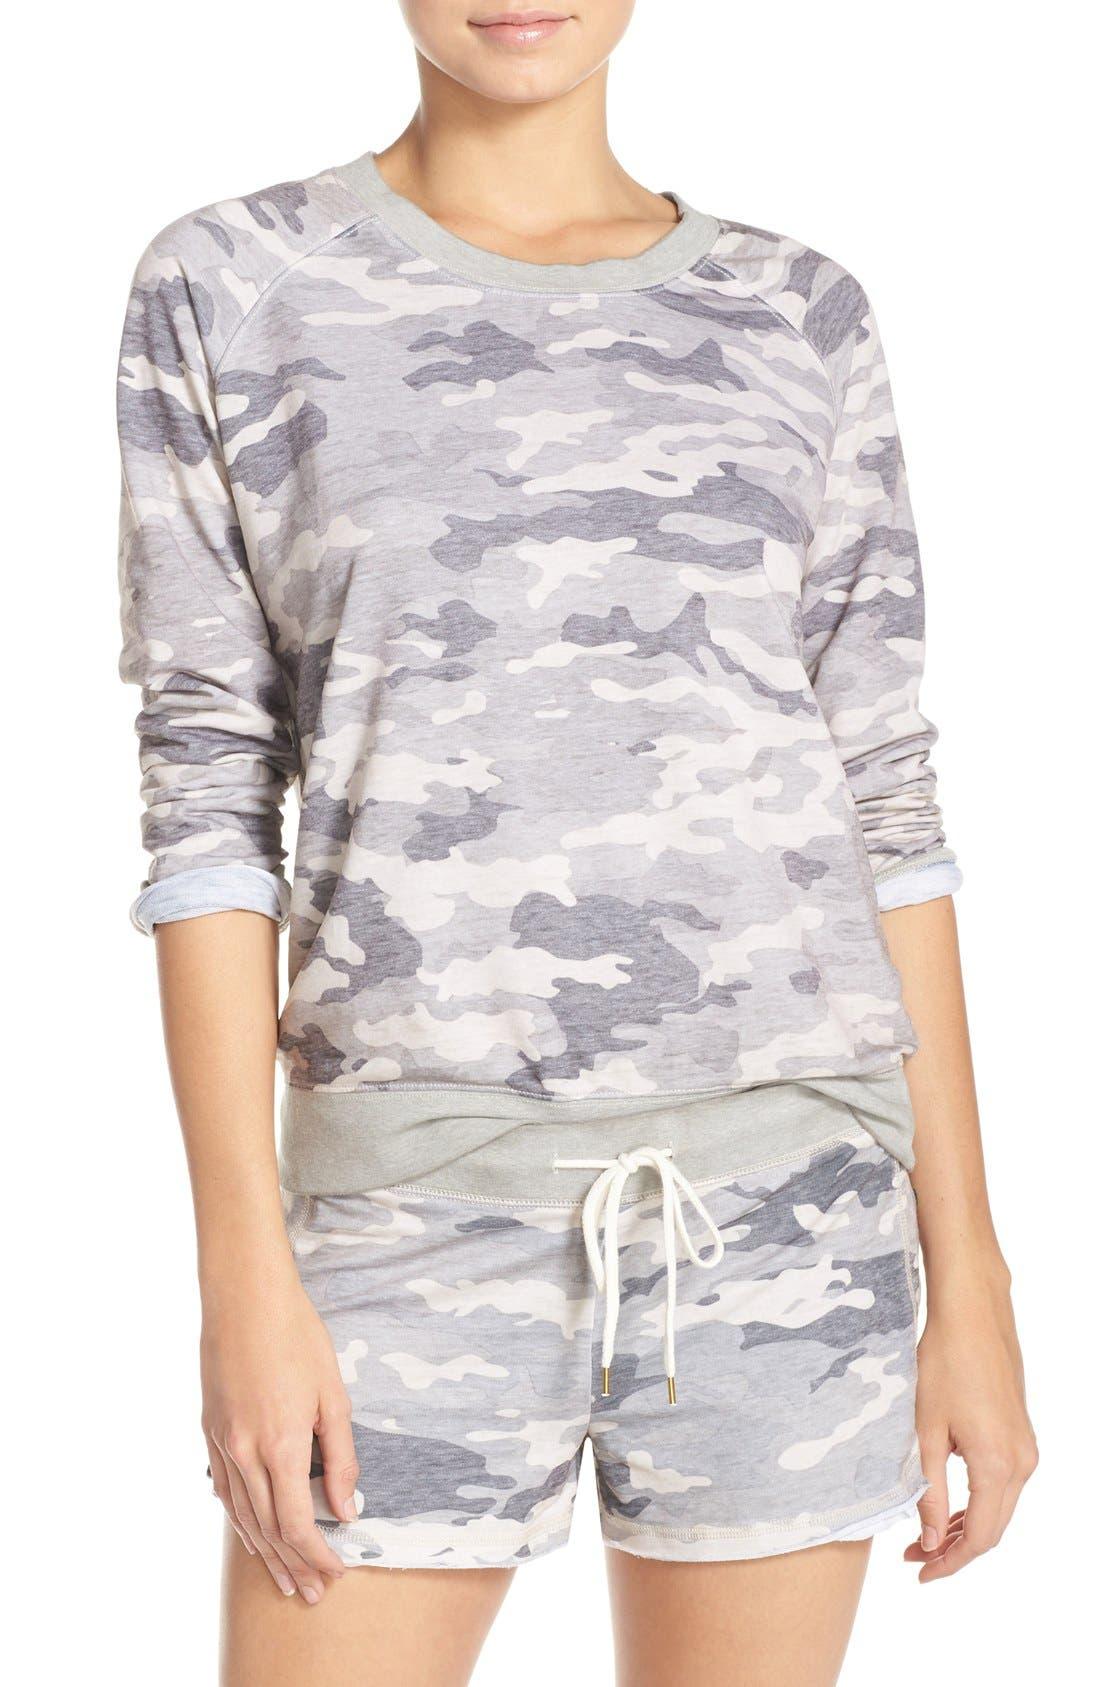 Burnout Lounge Sweatshirt,                             Main thumbnail 1, color,                             Grey Camo